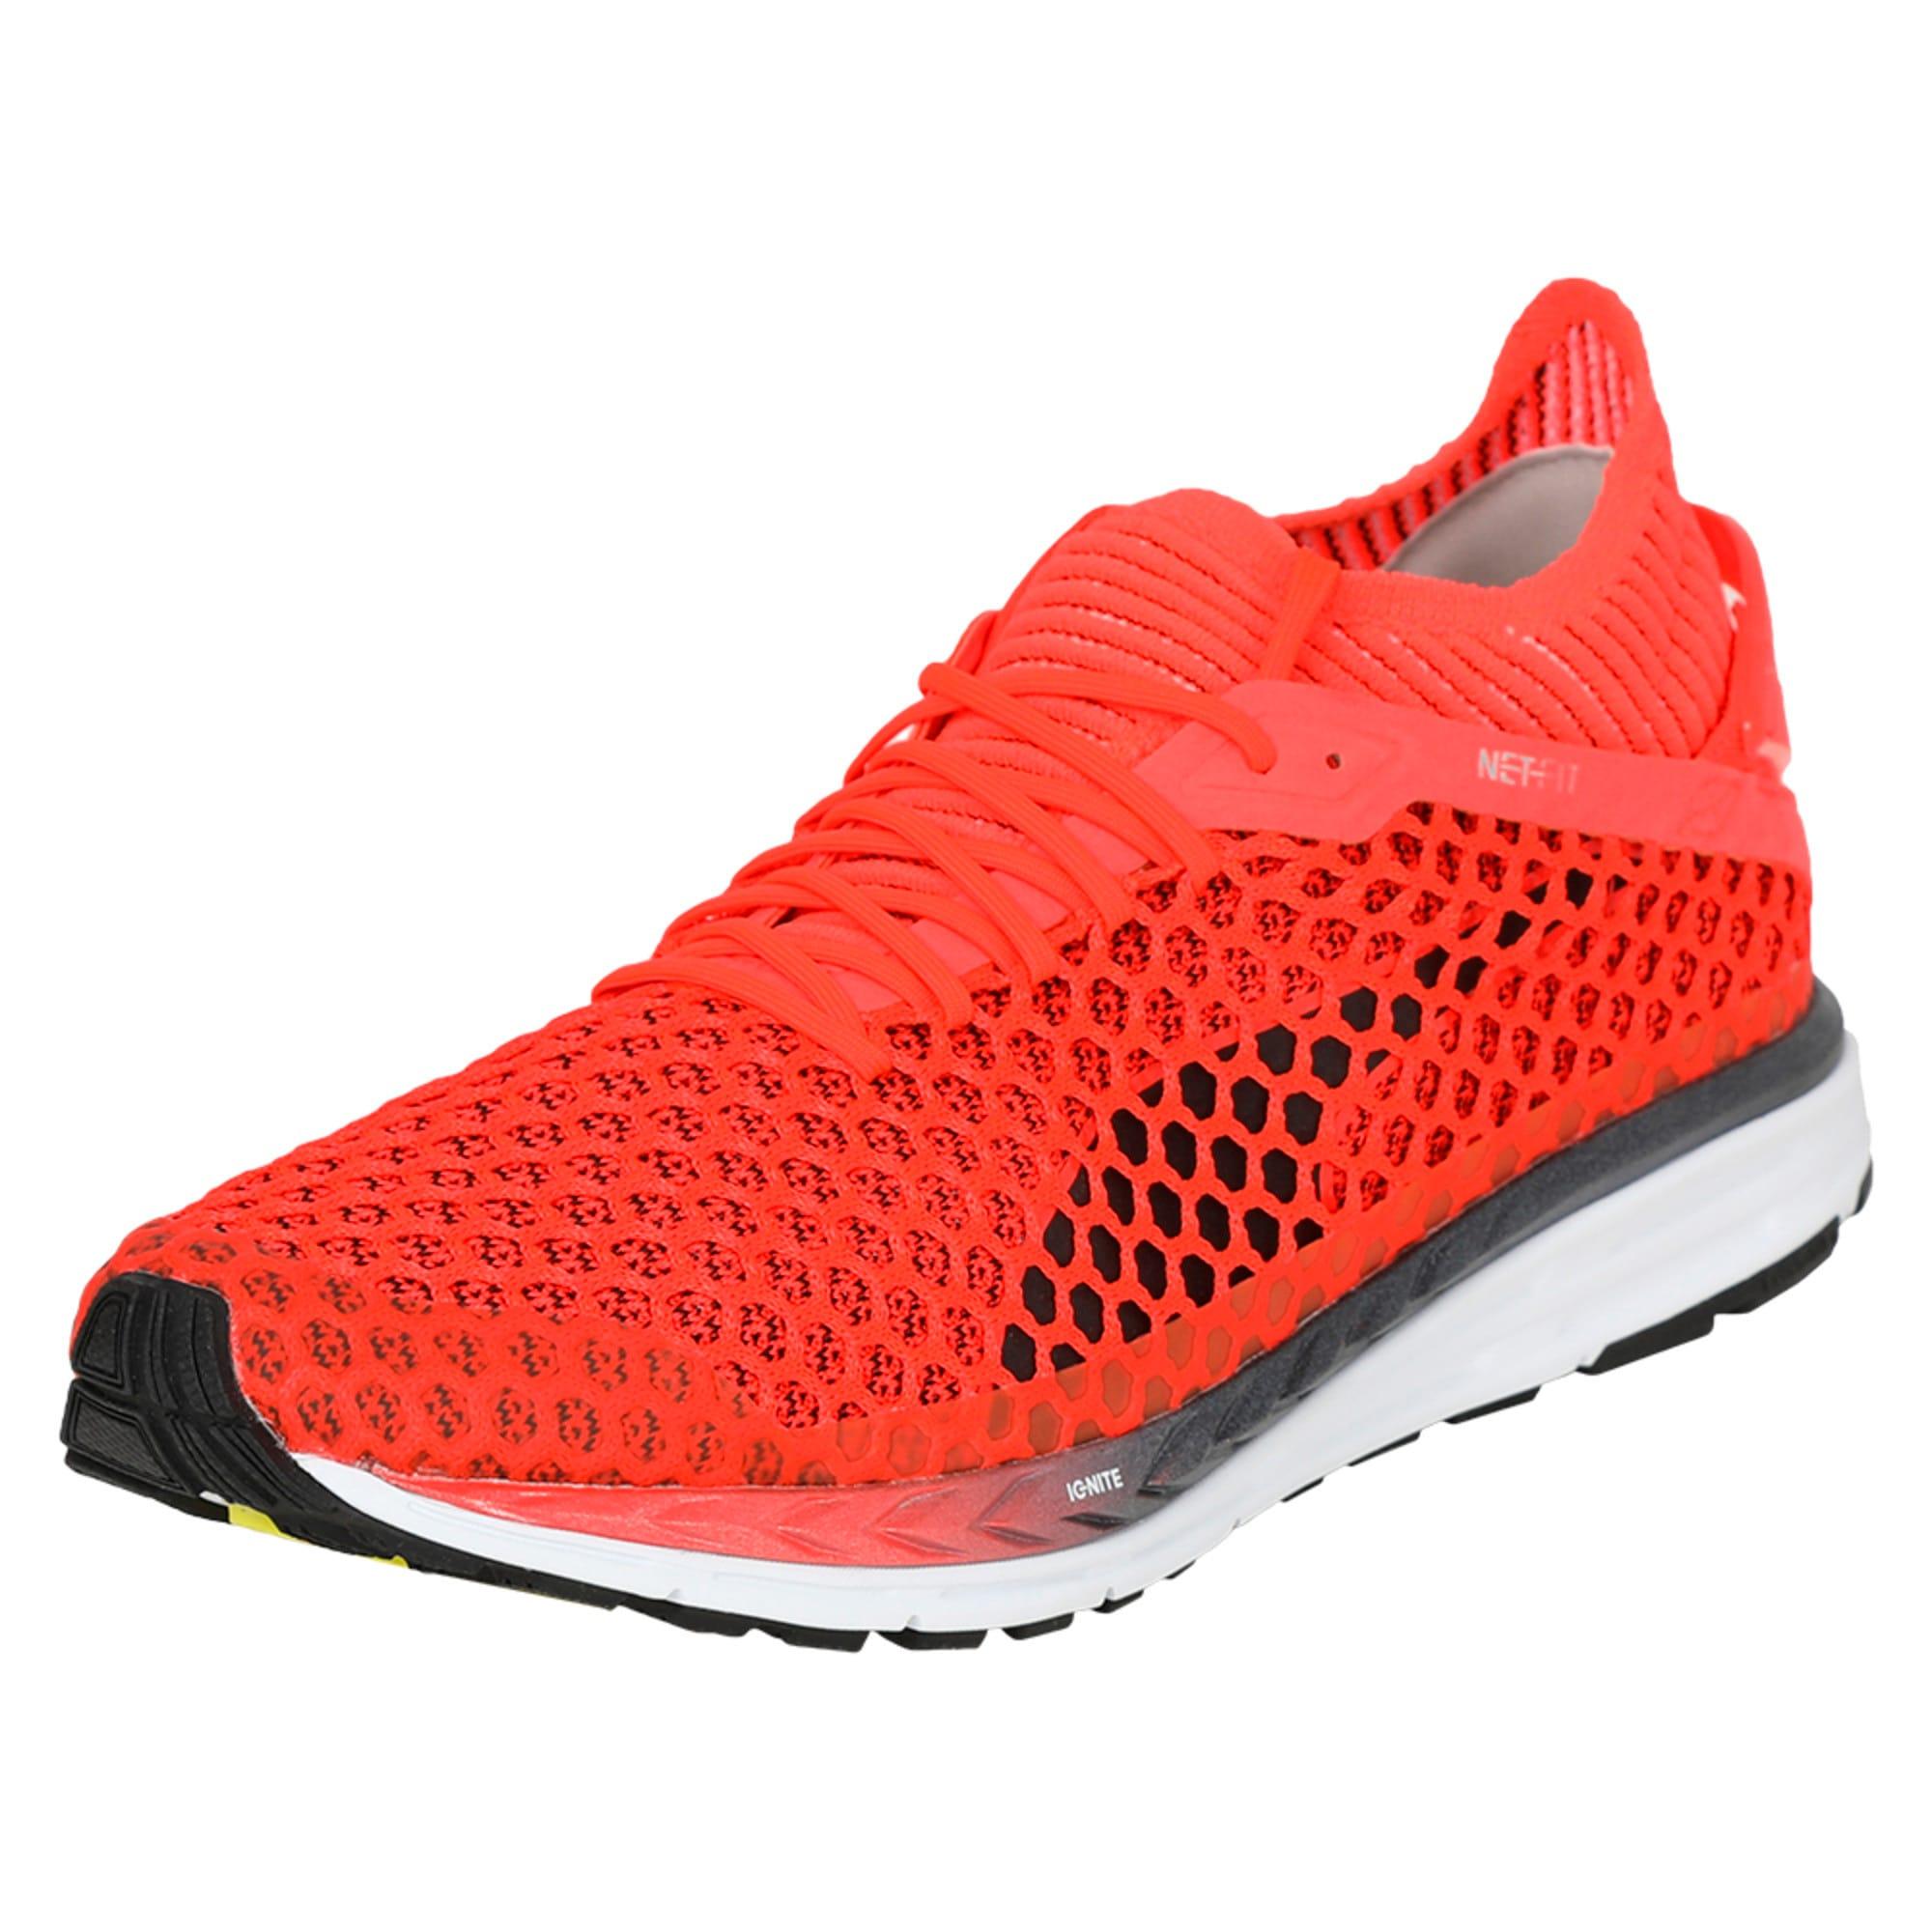 Thumbnail 1 of Speed IGNITE NETFIT 2 Men's Running Shoes, Red Blast-White-Black, medium-IND